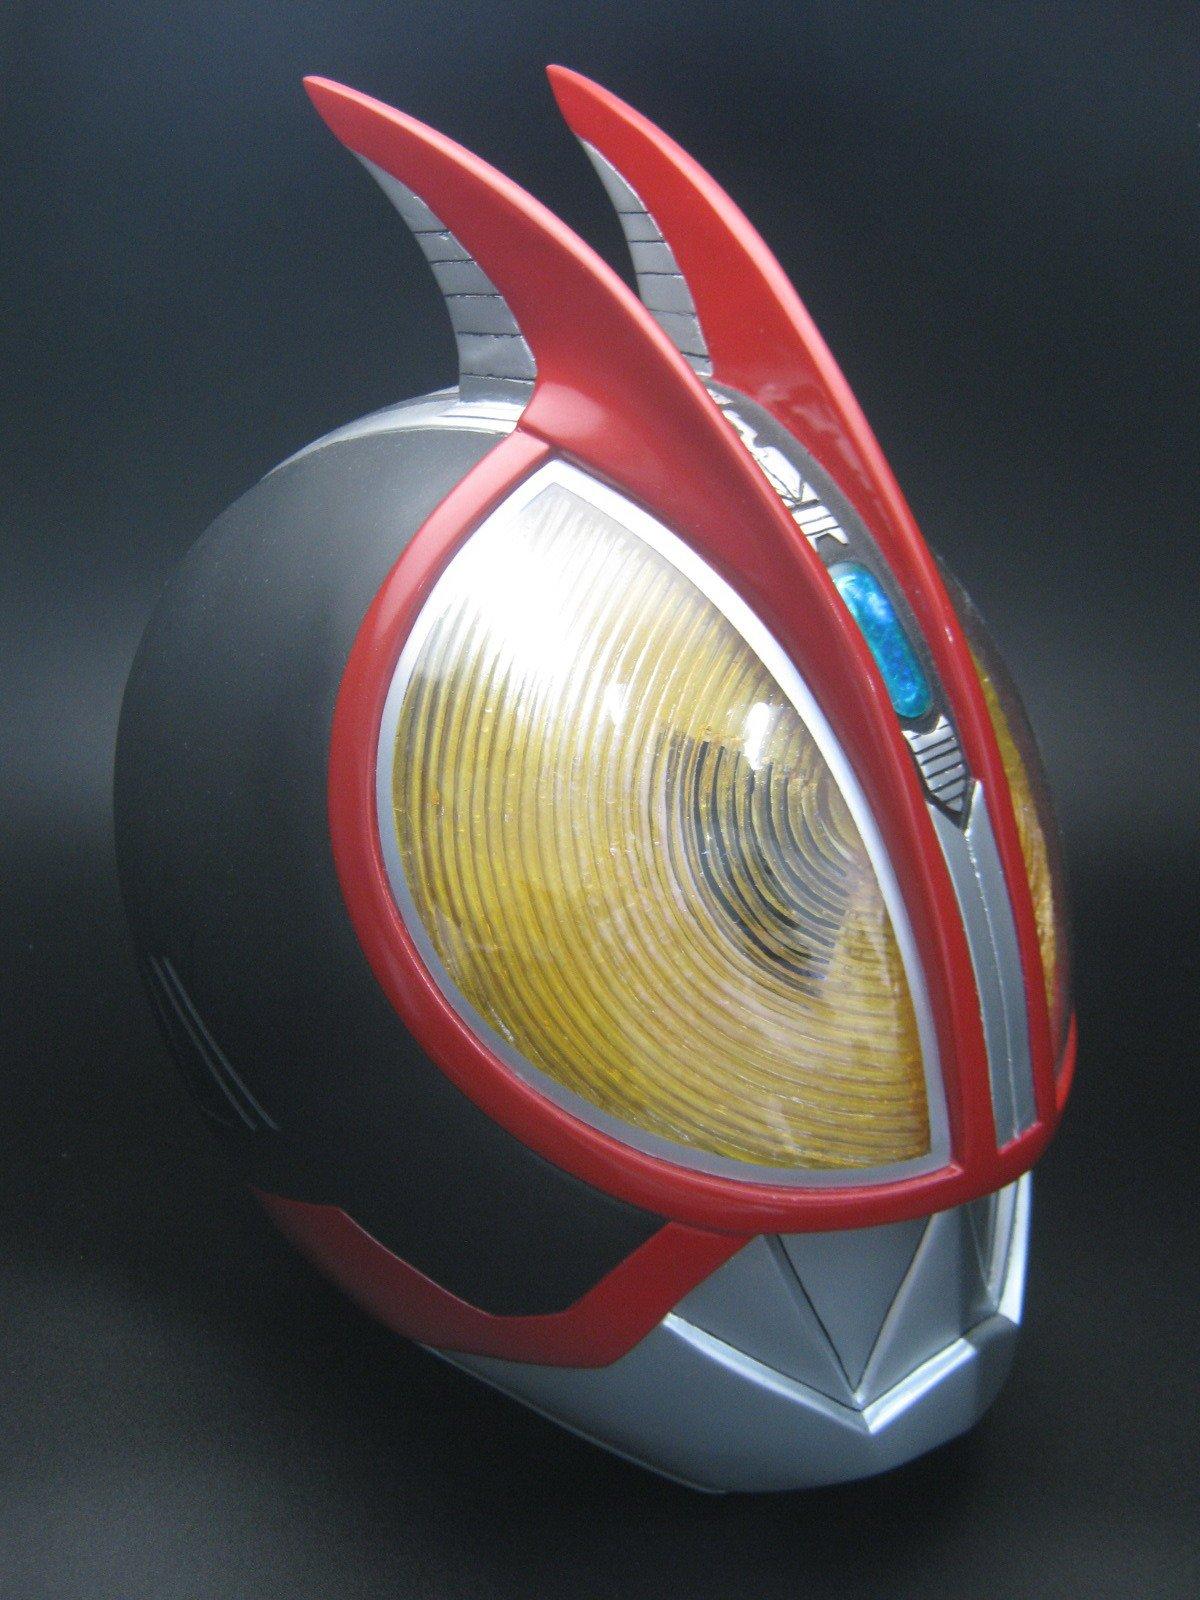 1:1 Wearable Kamen Rider Faiz 555 Fiberglass Helmet Cosplay by CustomMade